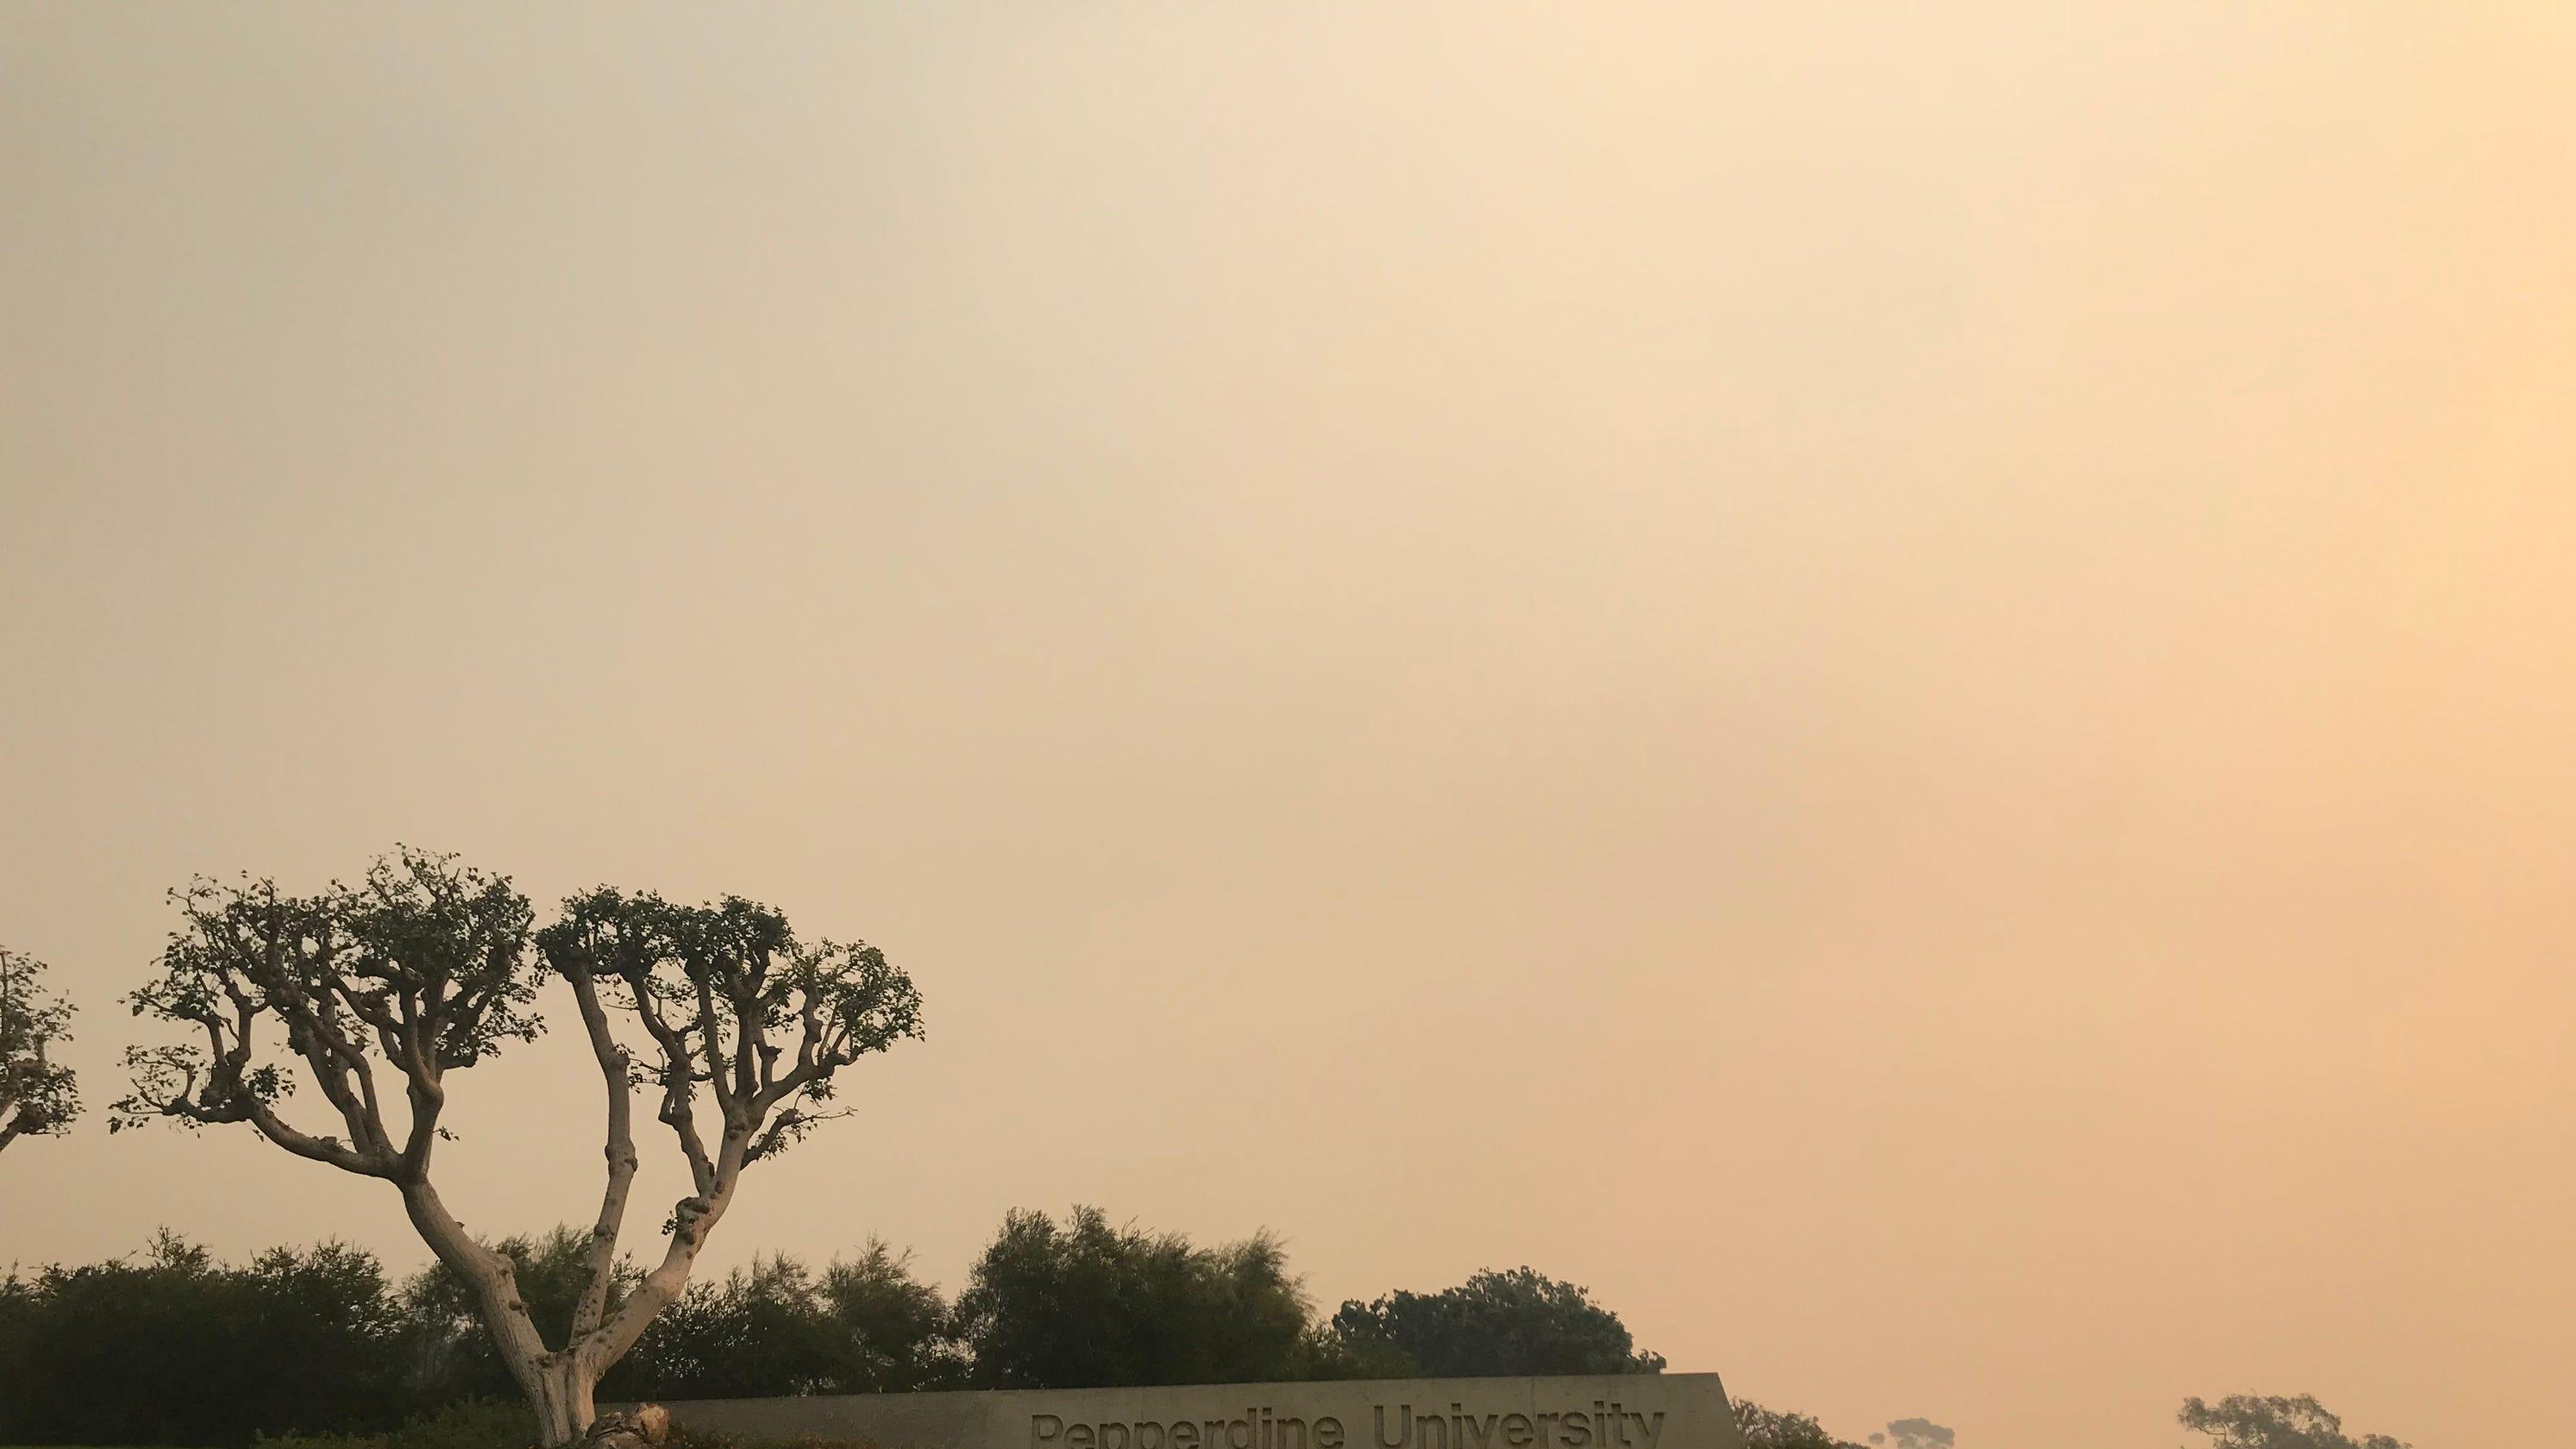 Pepperdine Malibu Campus Map.Southern California Fires Malibu S Pepperdine University Responds